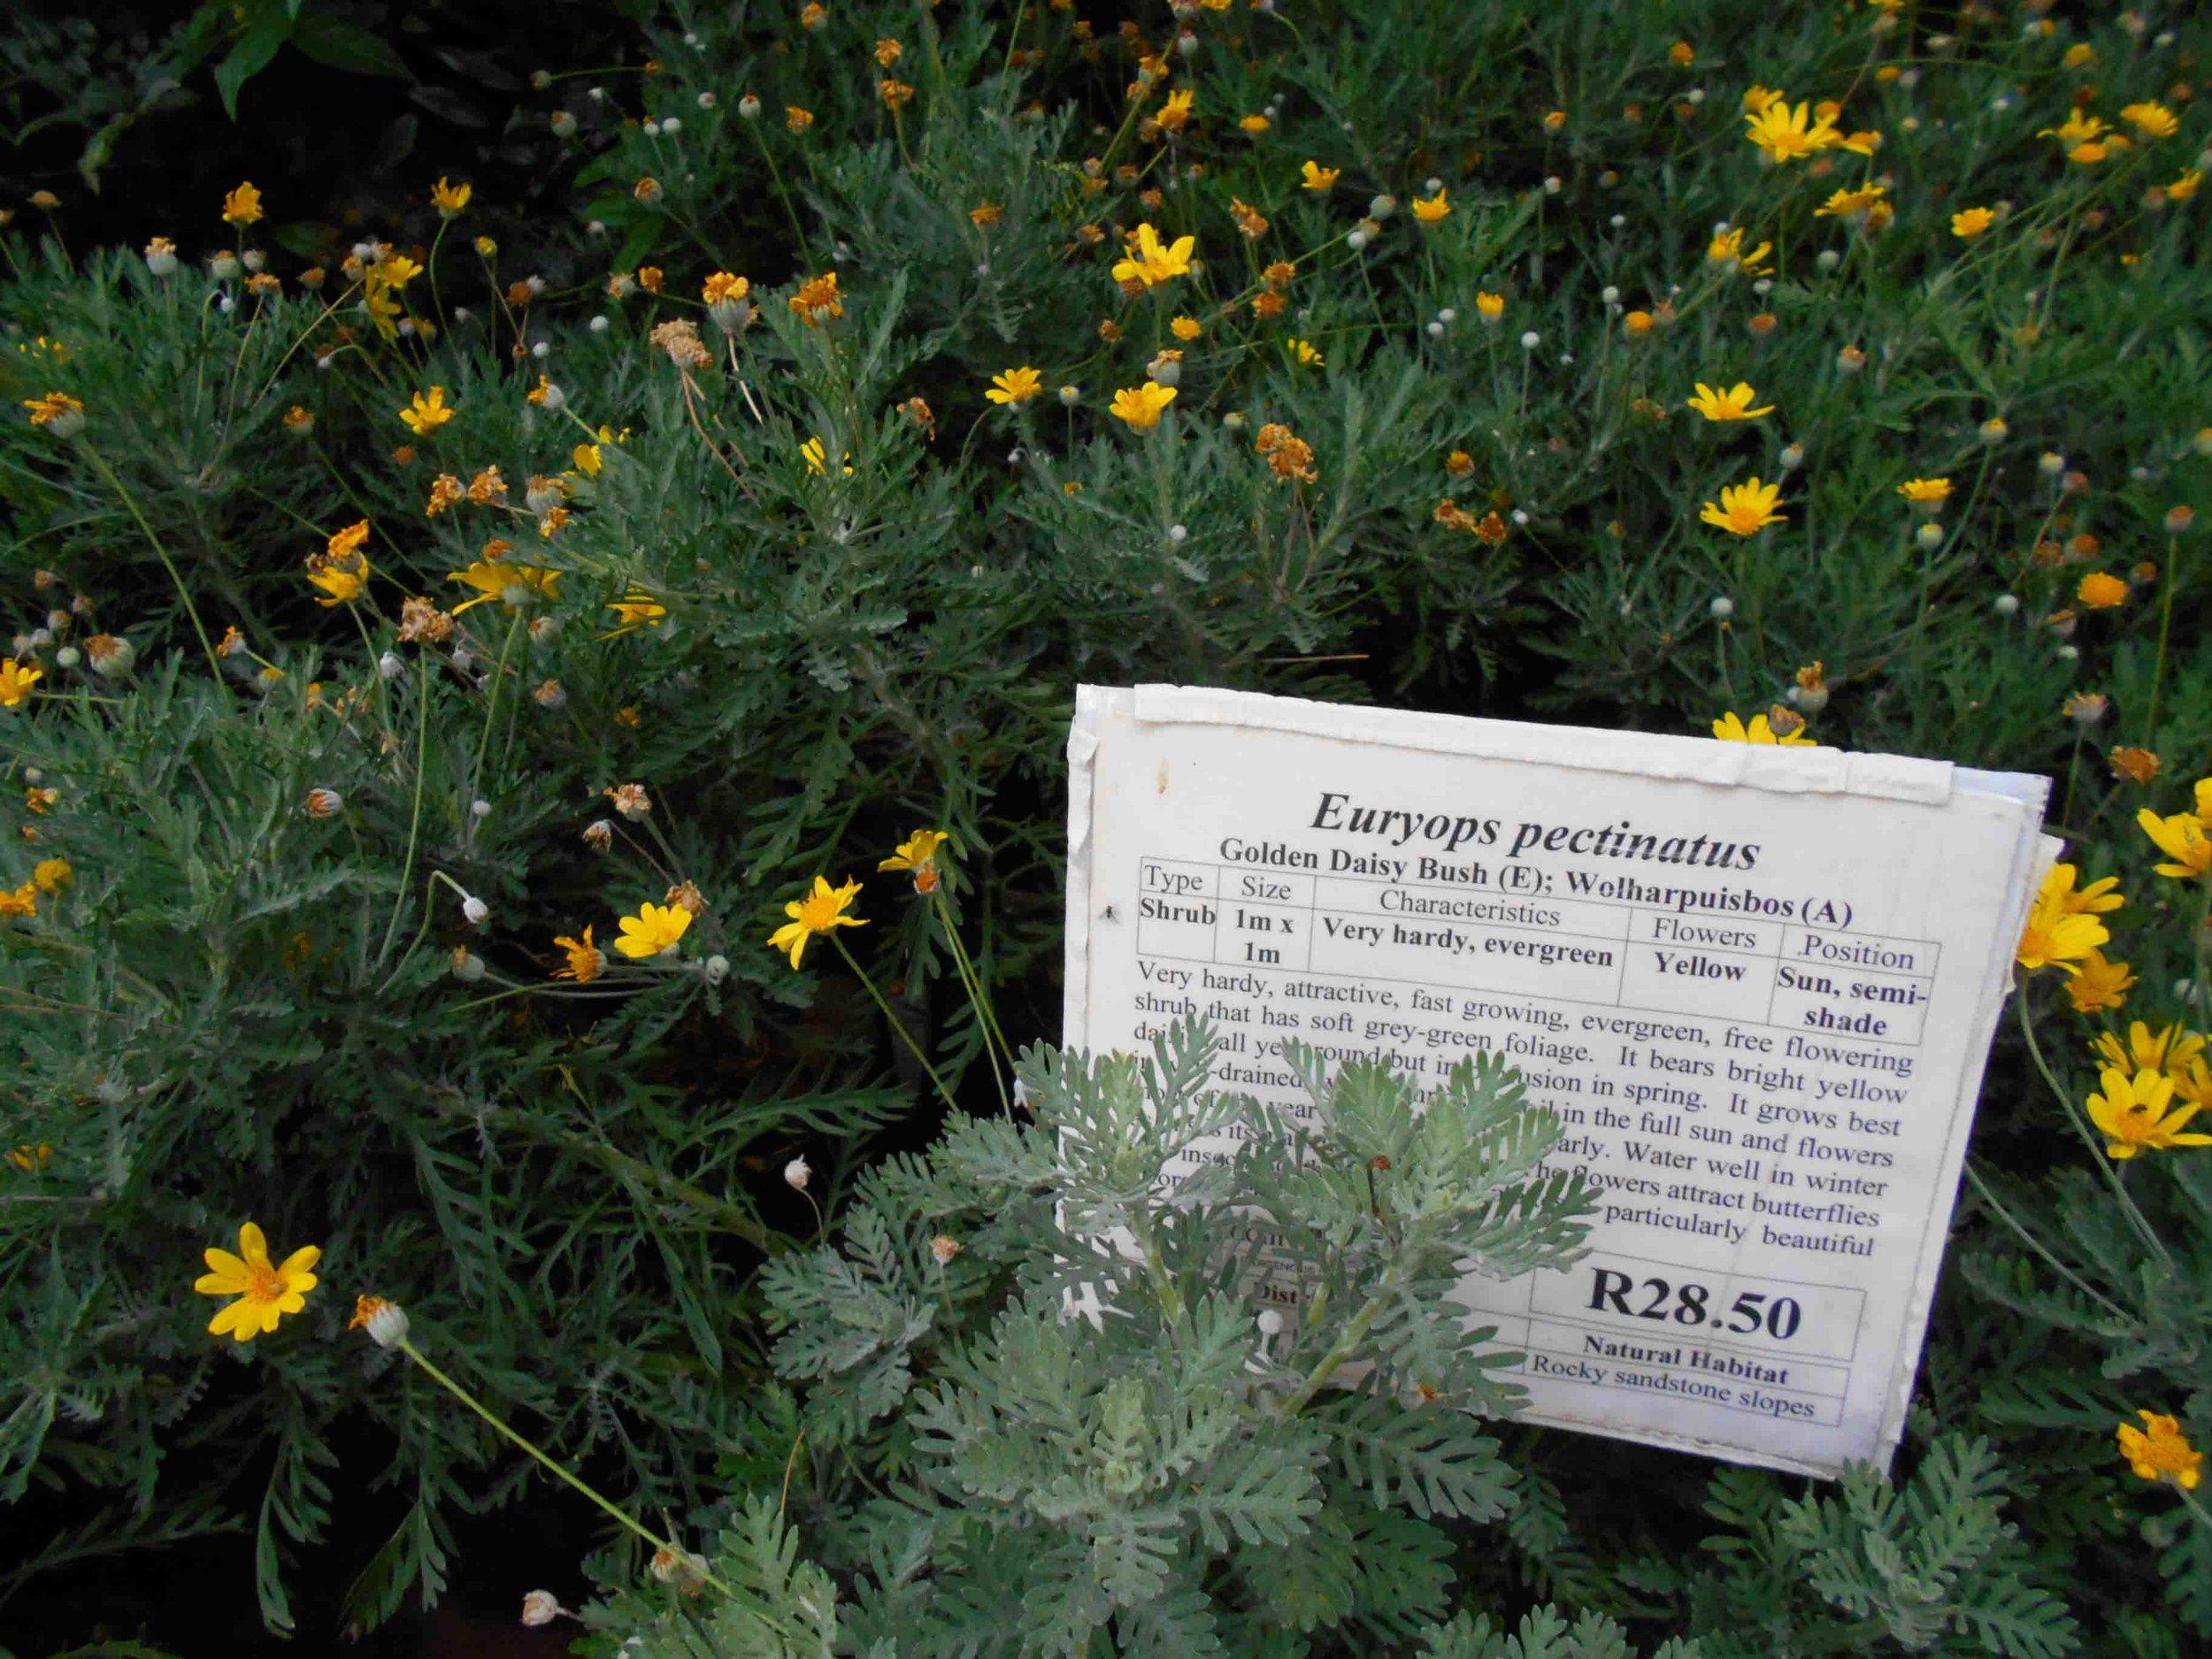 Euryops pectinatus - Golden Daisy Bush. Grey-Green Foliage